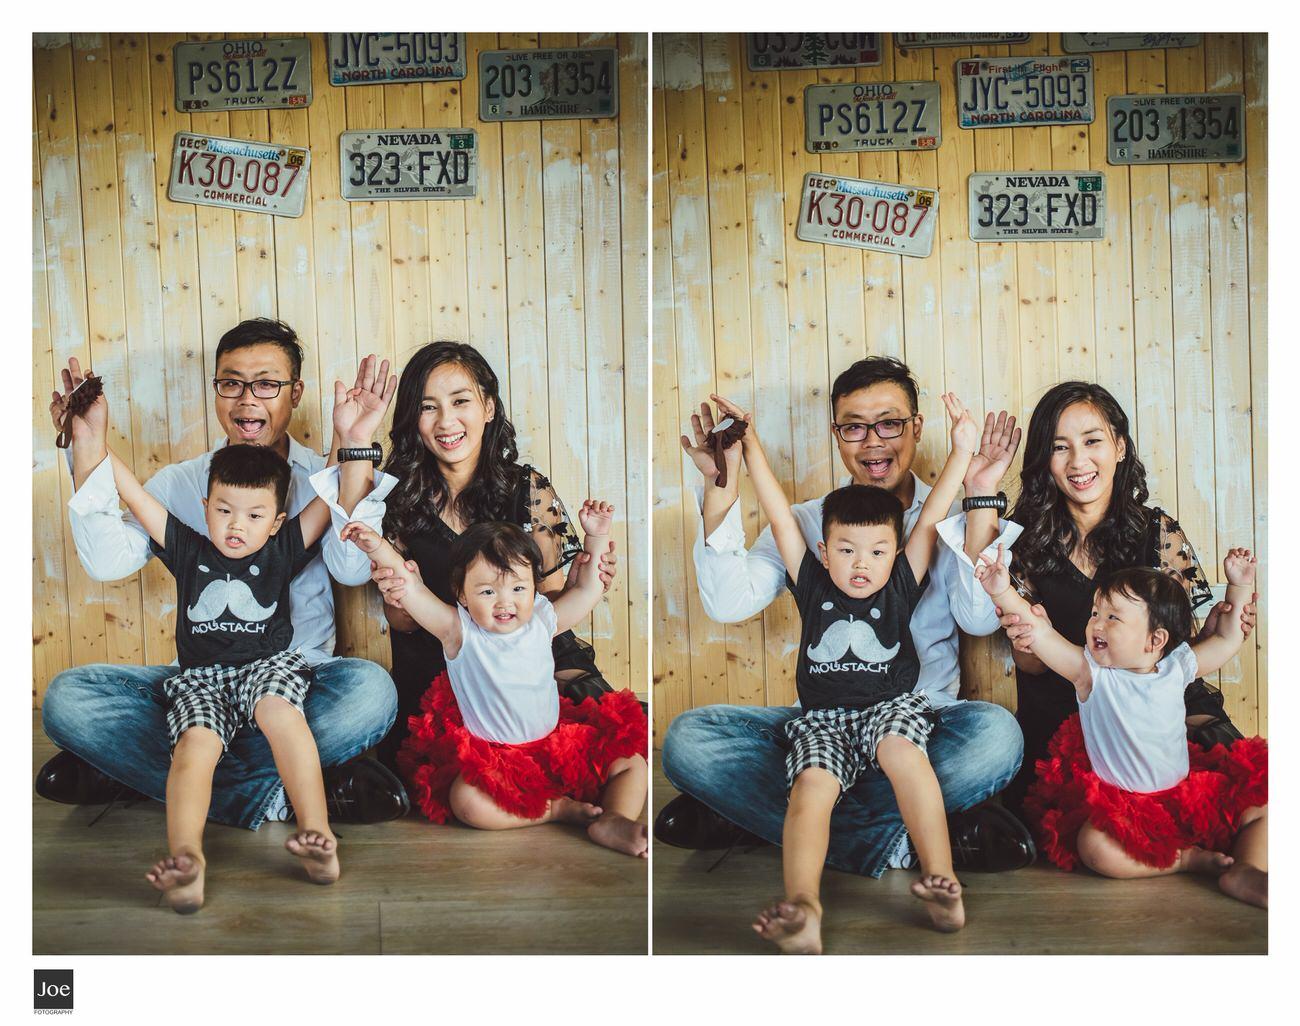 joe-fotography-family-photo-pepper-salt-bowtie-031.jpg